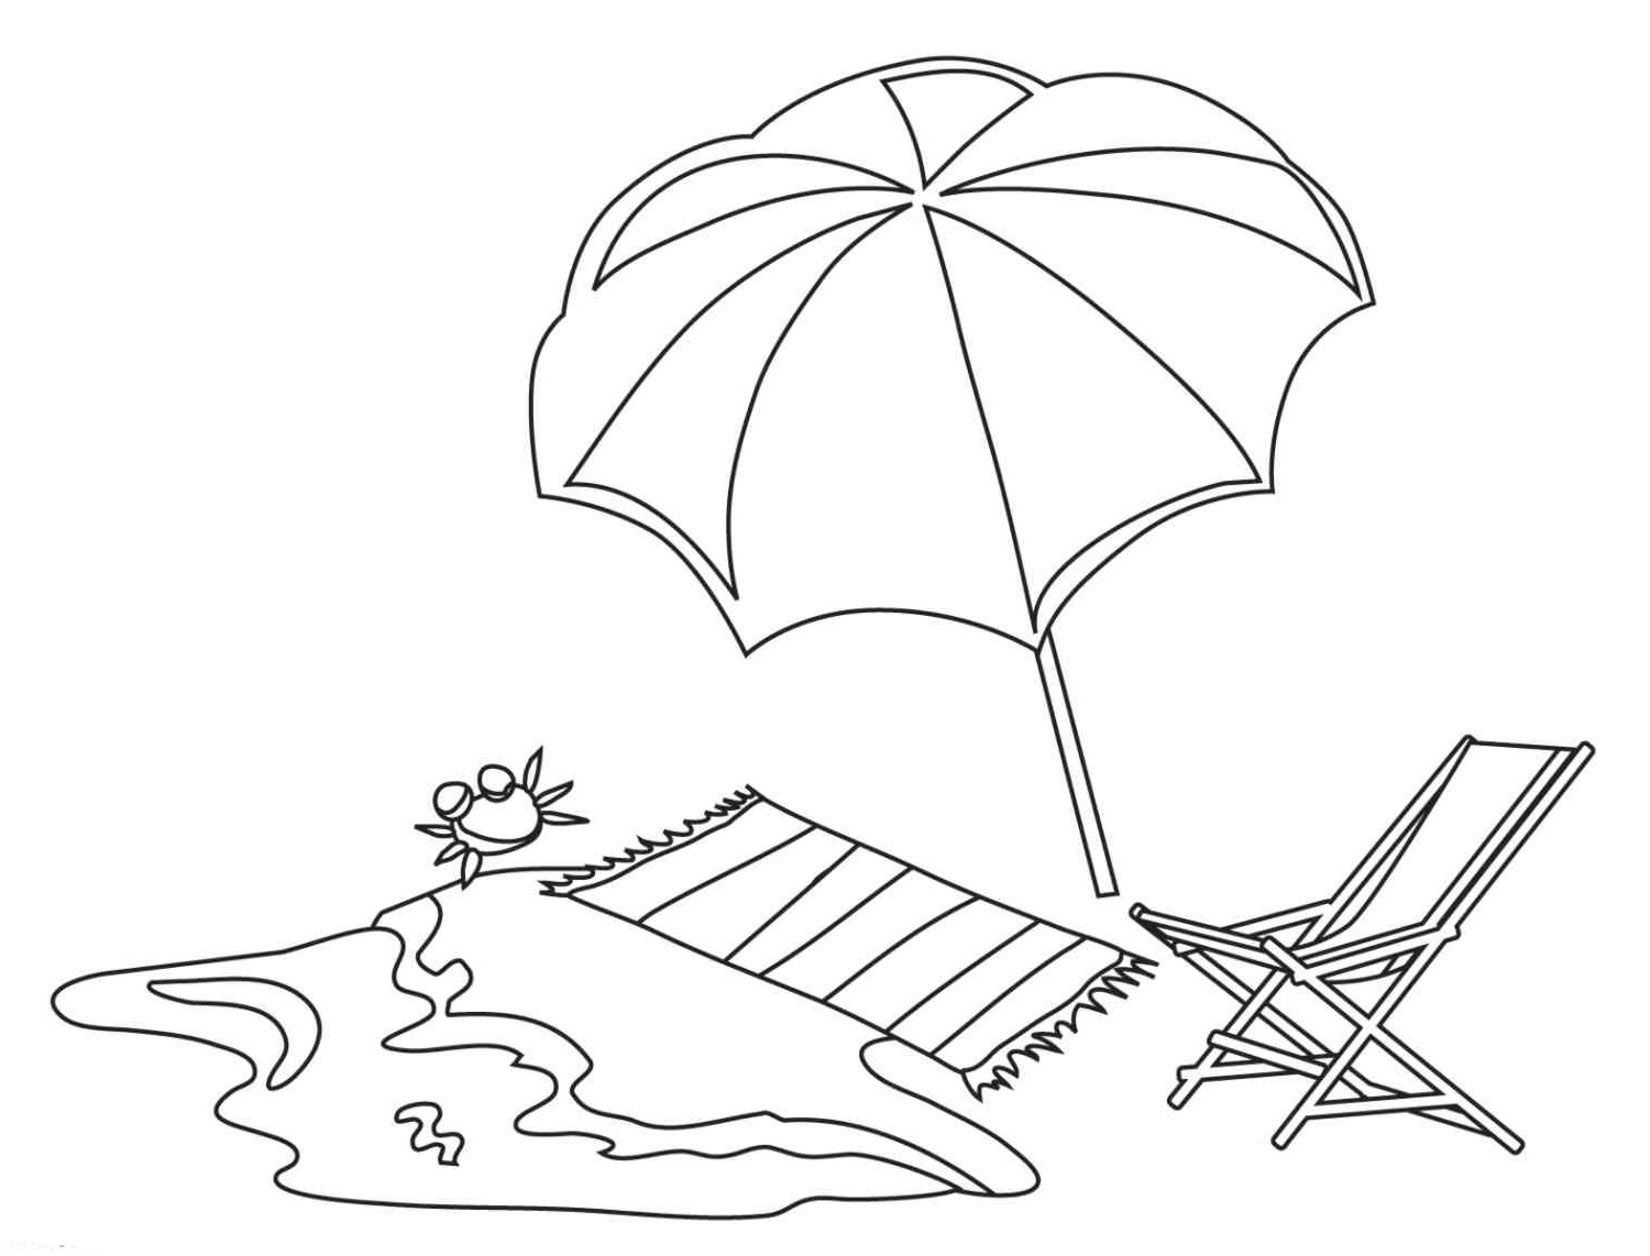 dibujo tumbona playa para colorear Buscar con Google Dibuixos